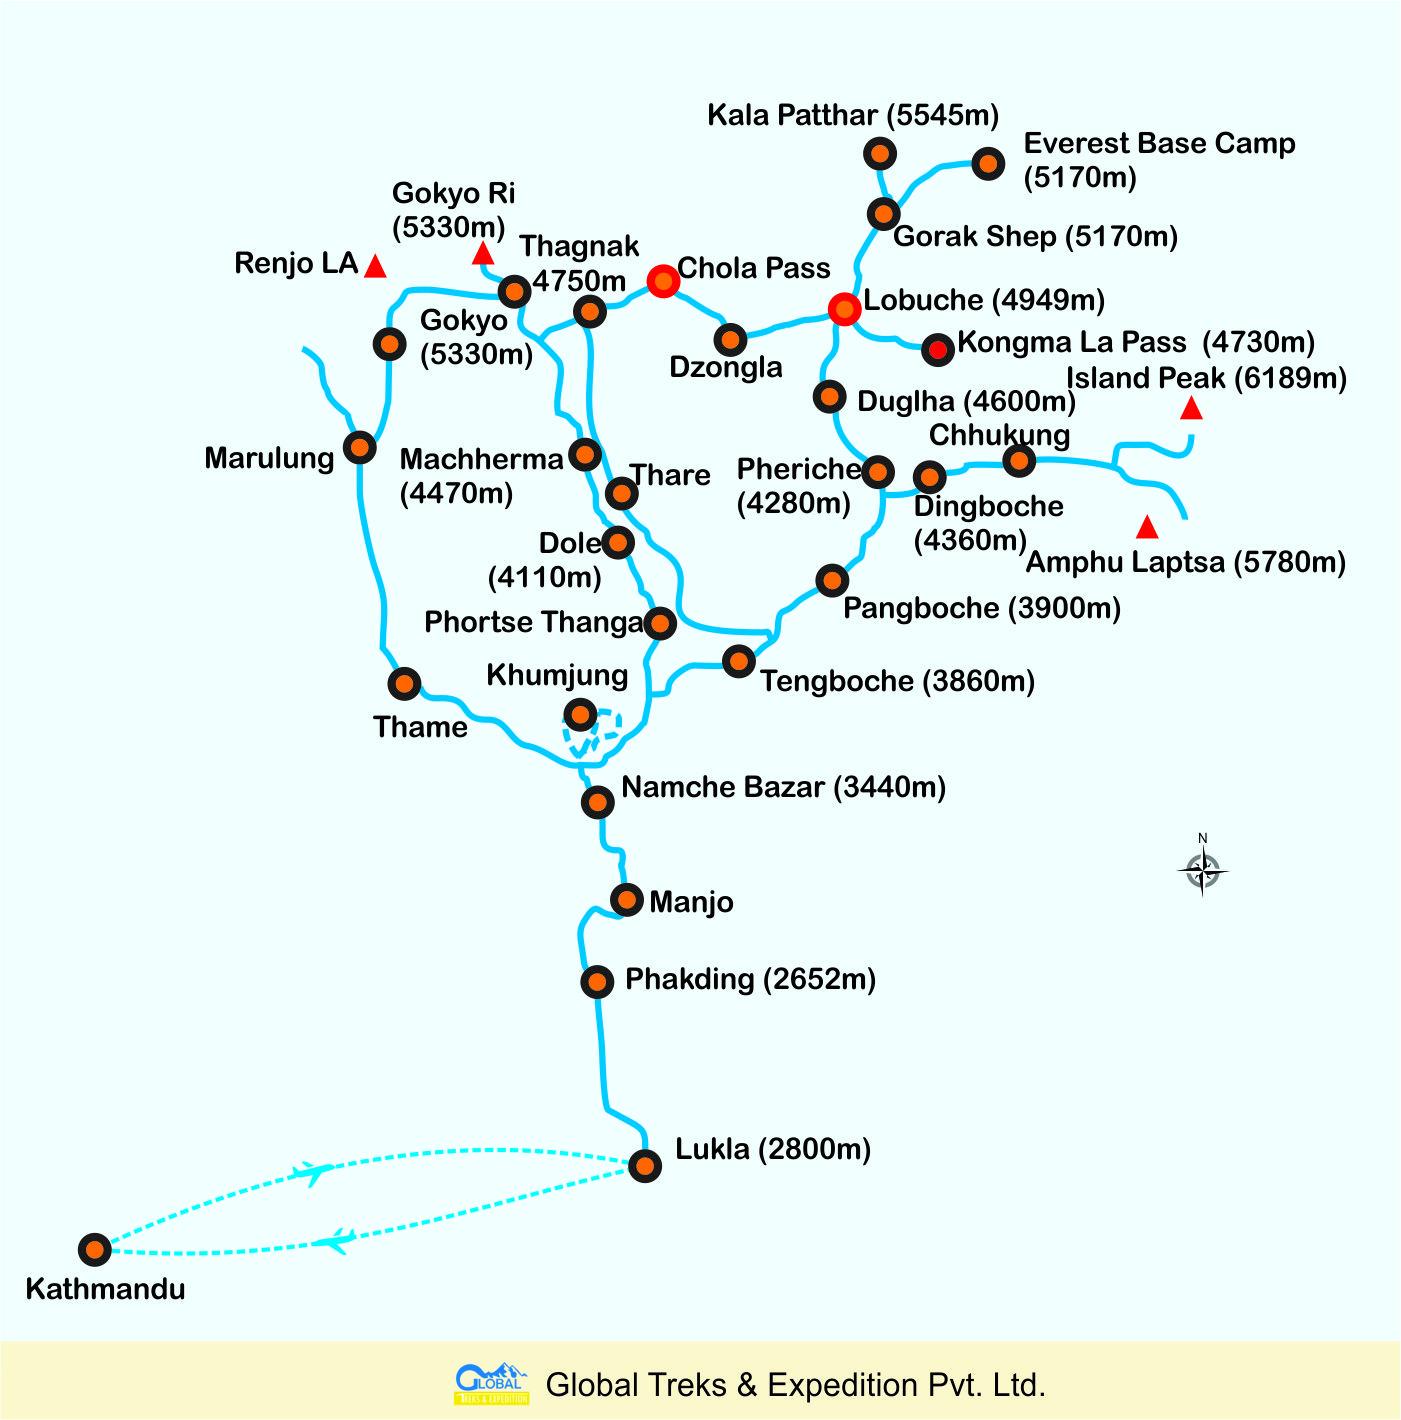 Map of Everest Base Camp Three Passes Trek